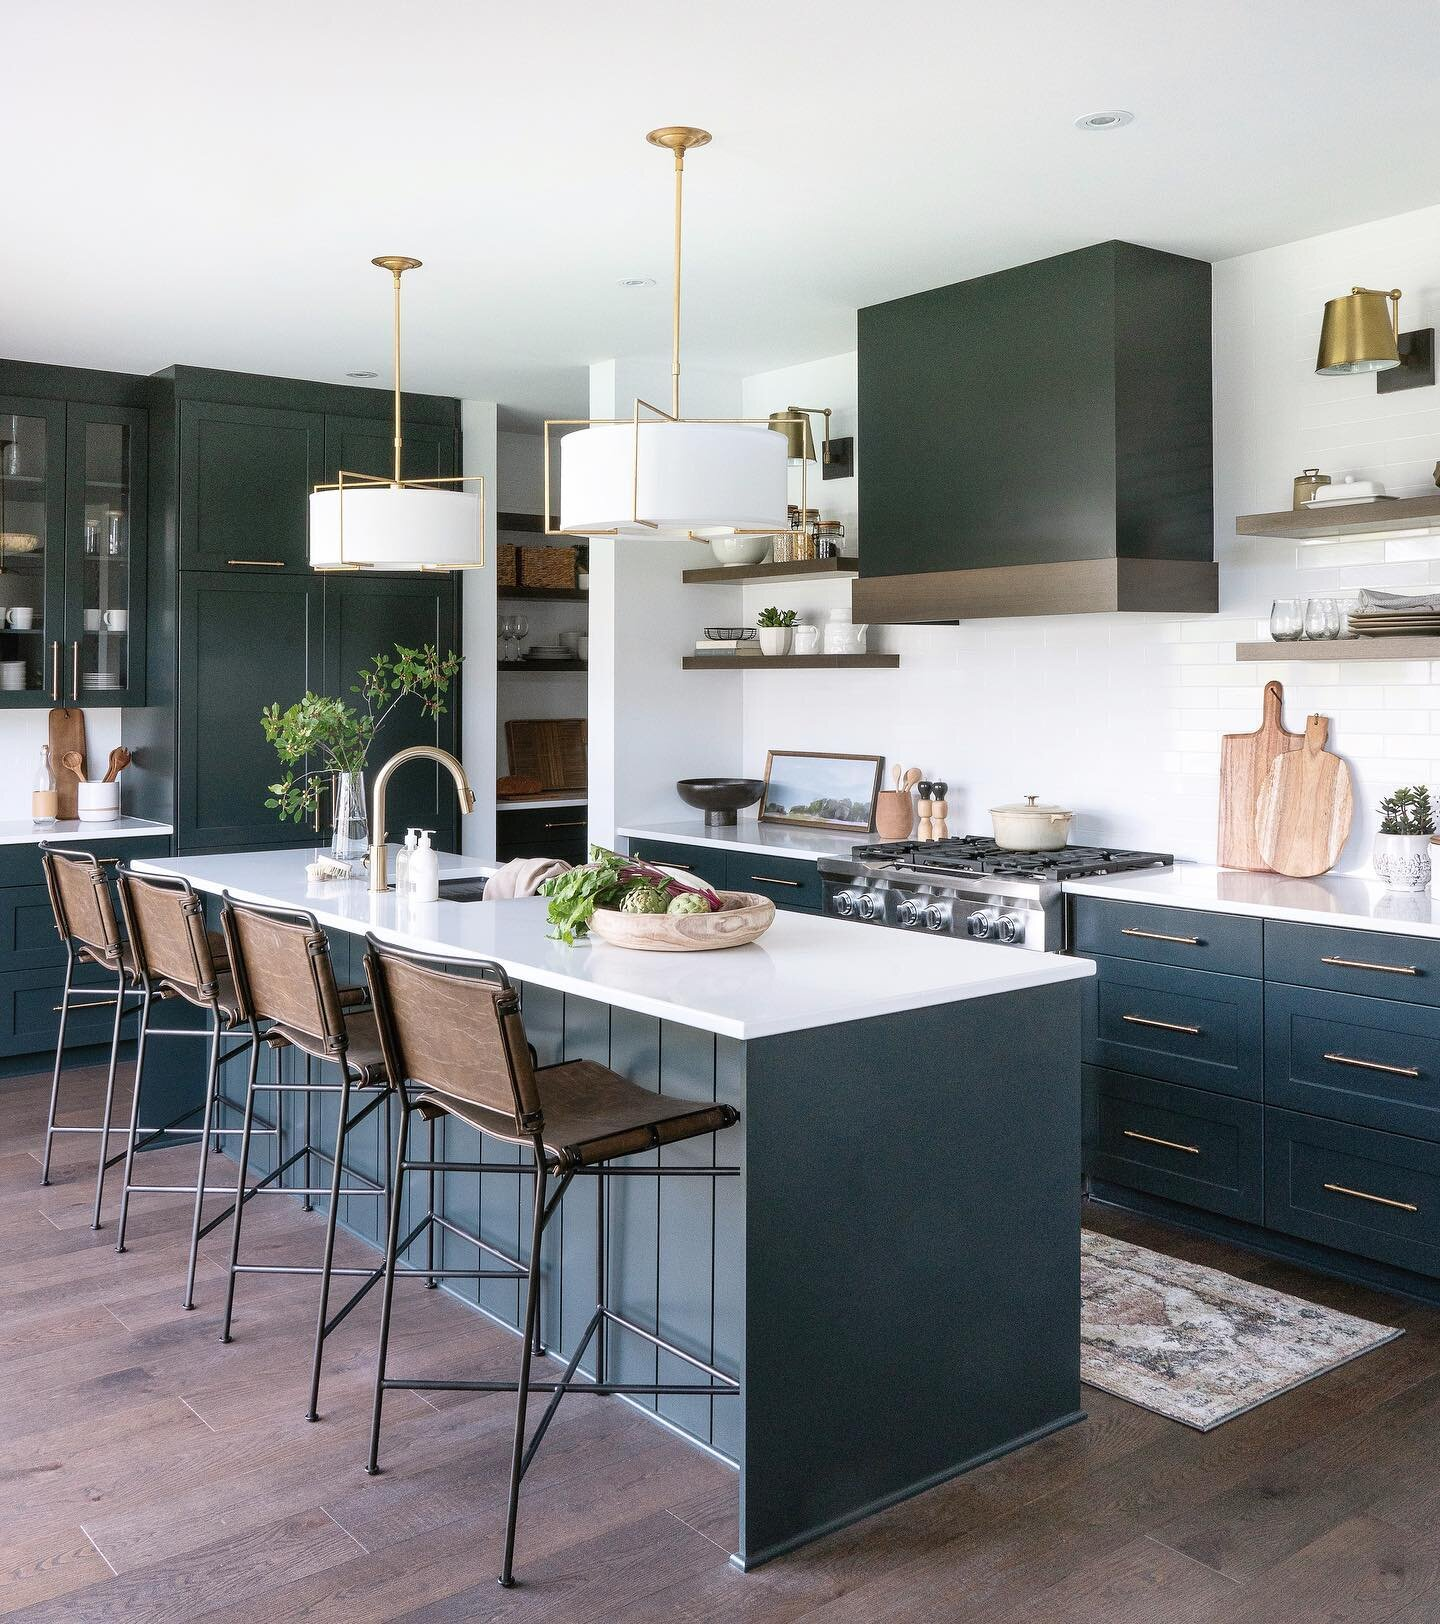 Shop the kitchen |   Liam Pendants  ,   Wharton Counter Stool  ,   Watson Sconces